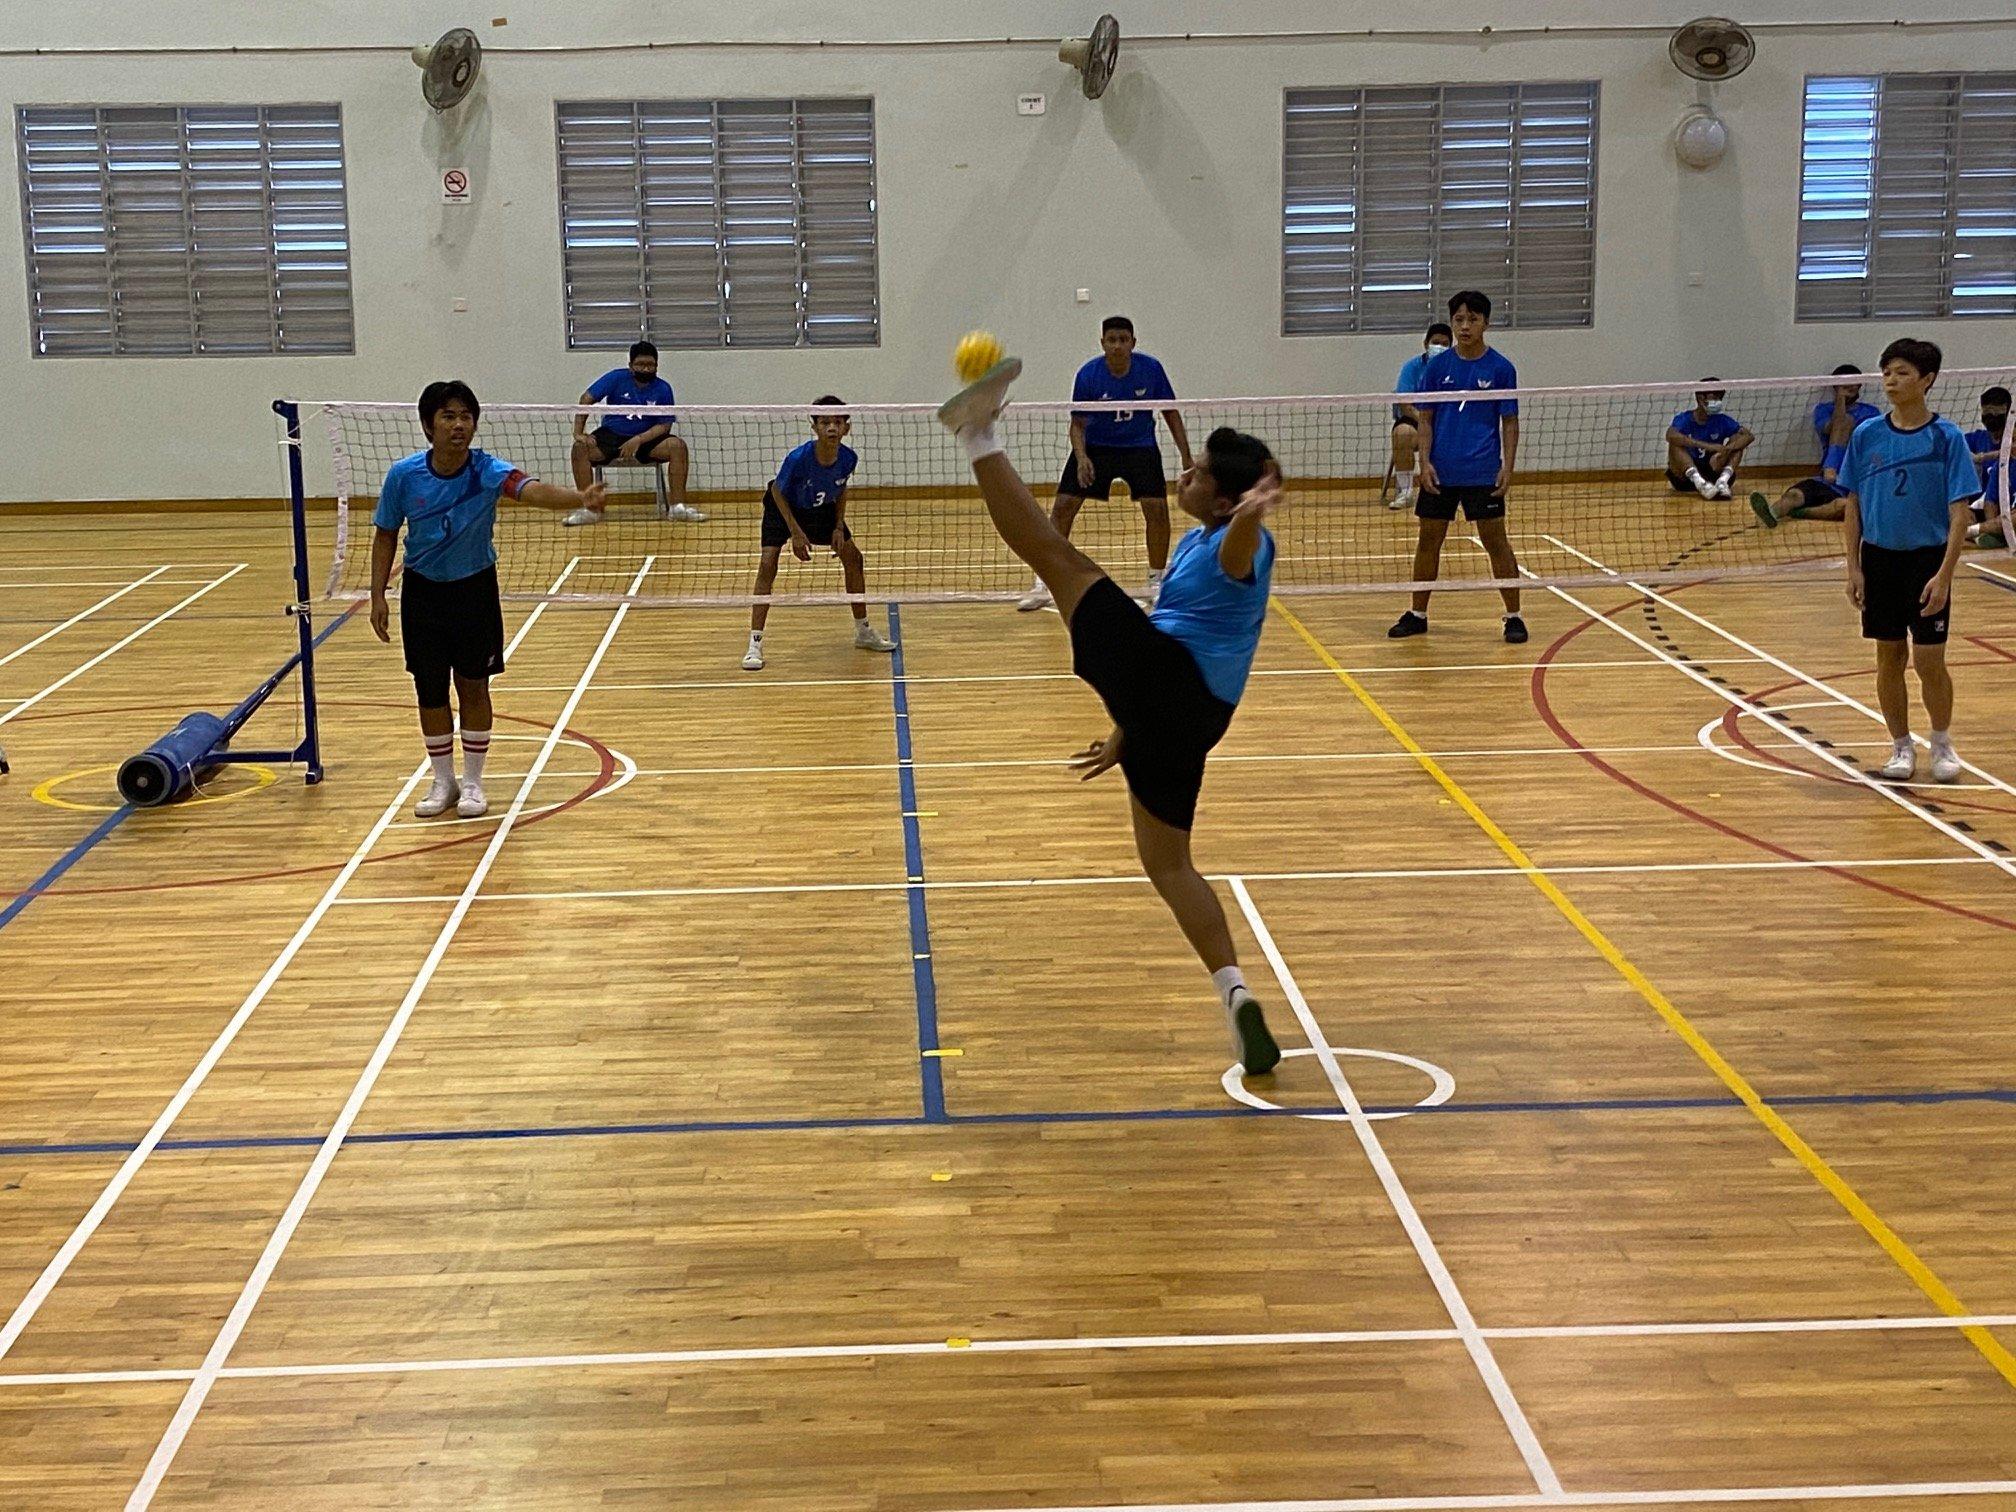 NSG B Div sepak takraw - Bartley Sec (light blue) vs Yishun (dark blue)